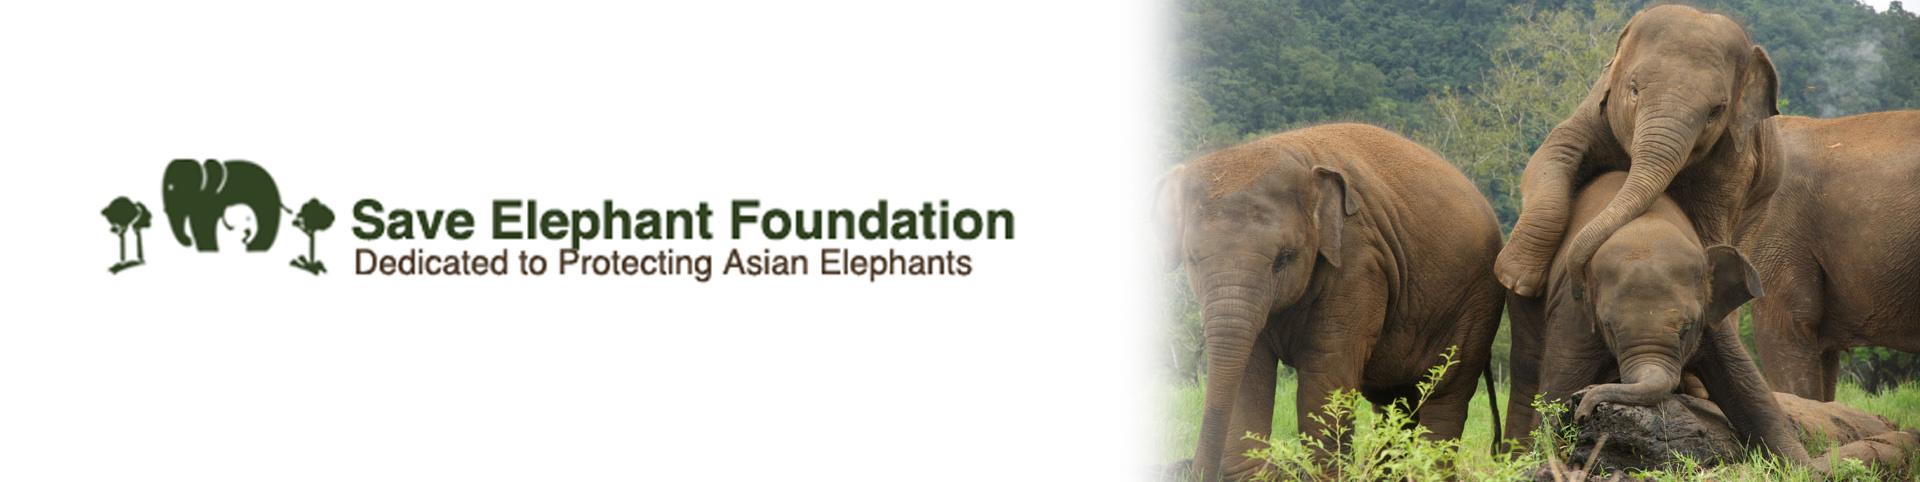 Save the Elephants Foundation